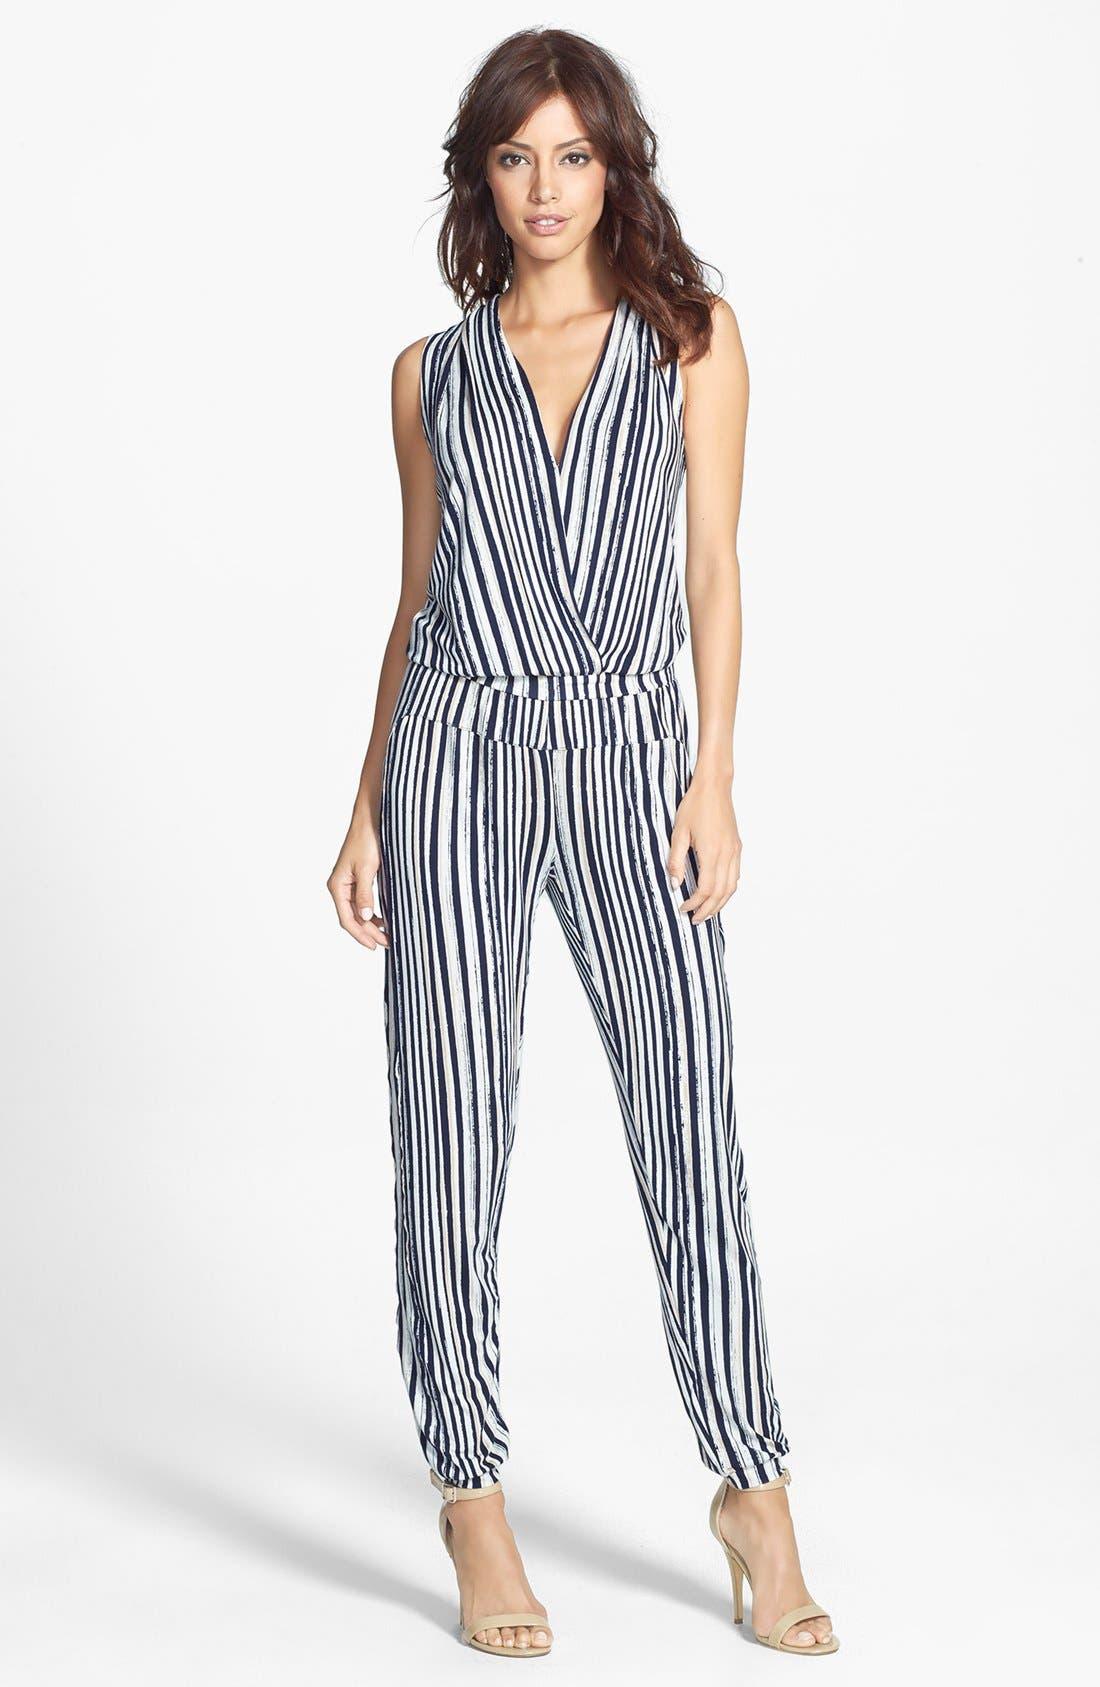 Alternate Image 1 Selected - Tart 'Harli' Stripe Surplice Jumpsuit